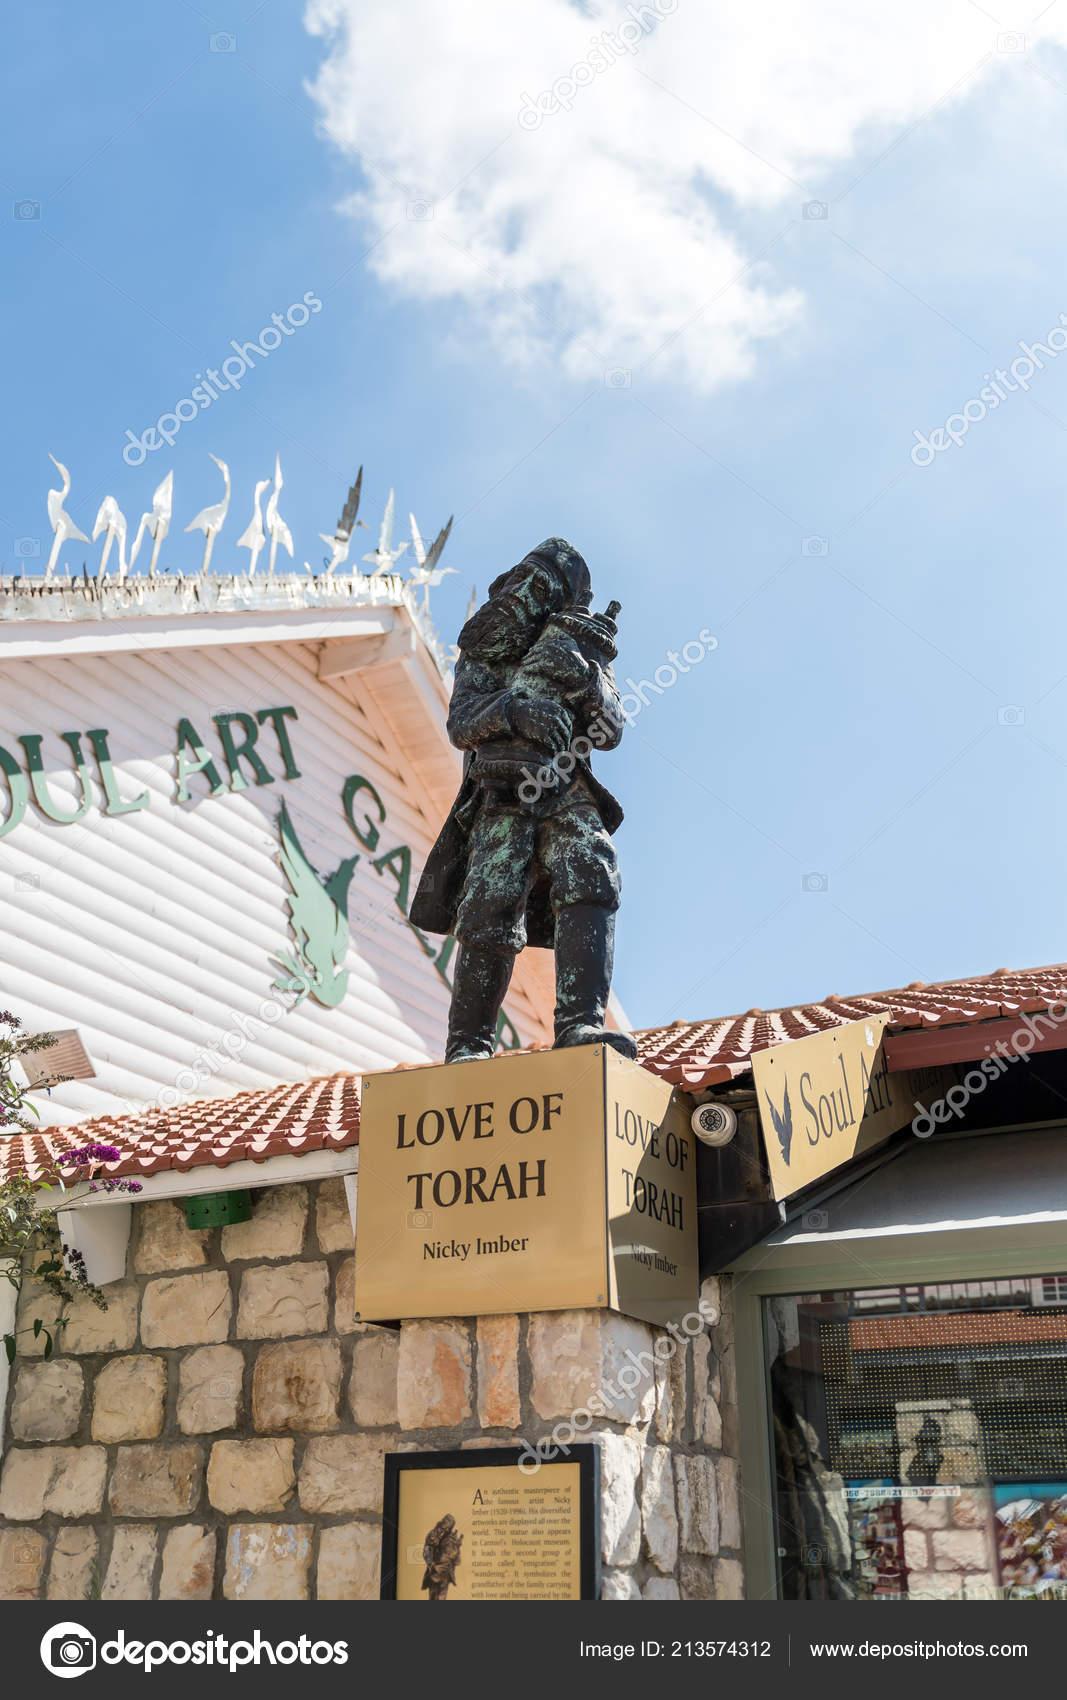 Safed Israel September 2018 Sculpture Called Love Torah Executed